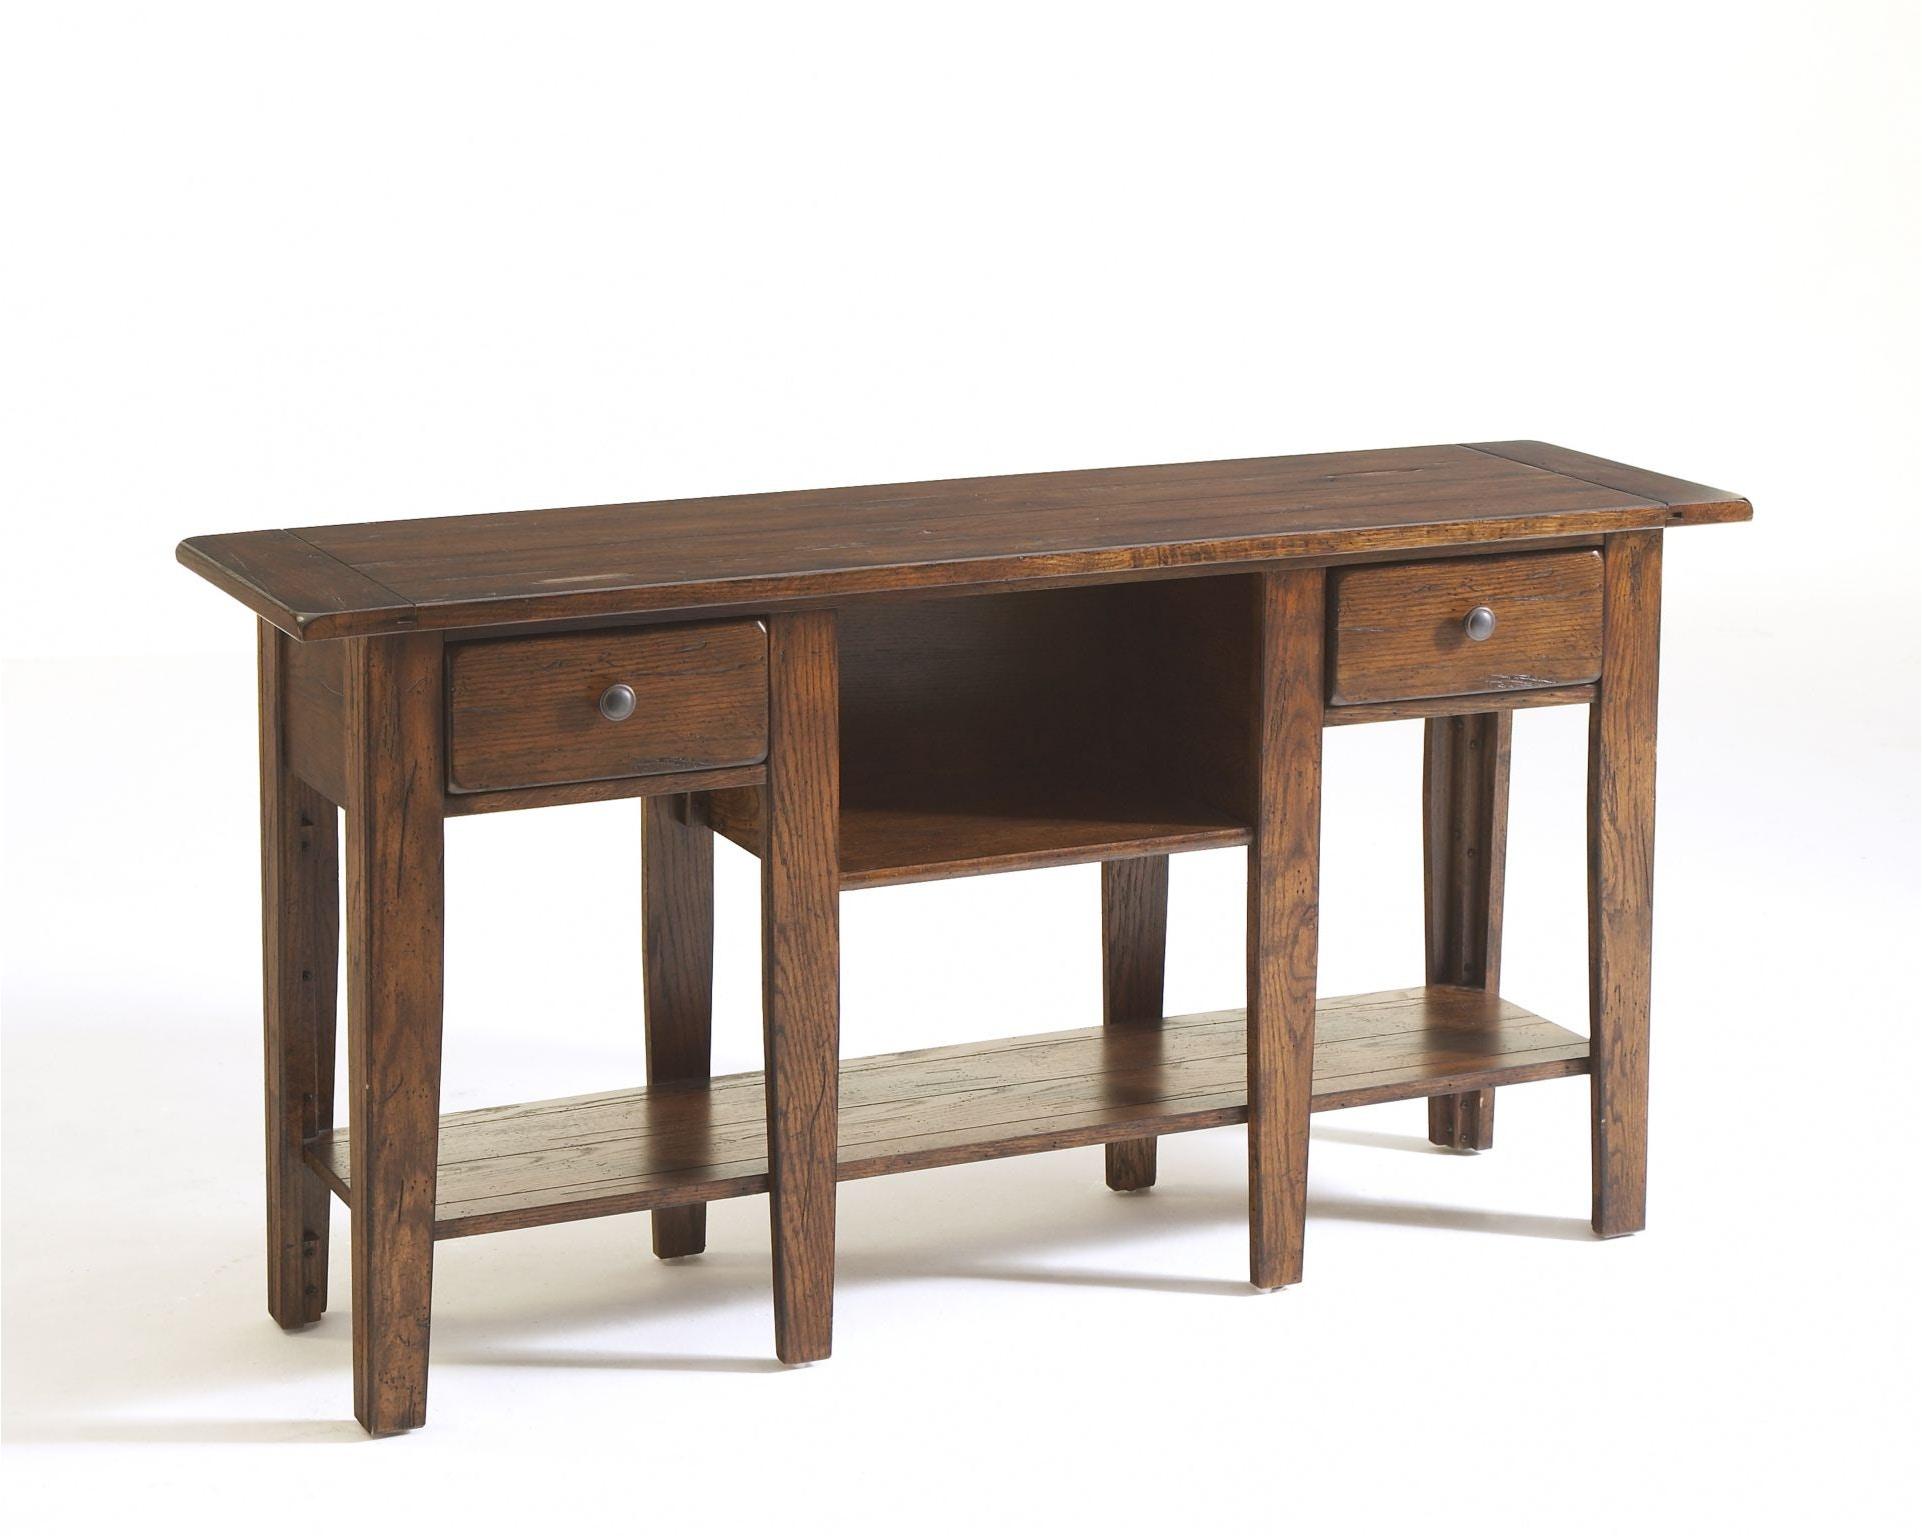 Broyhill Living Room Attic Heirlooms Sofa Table Rustic